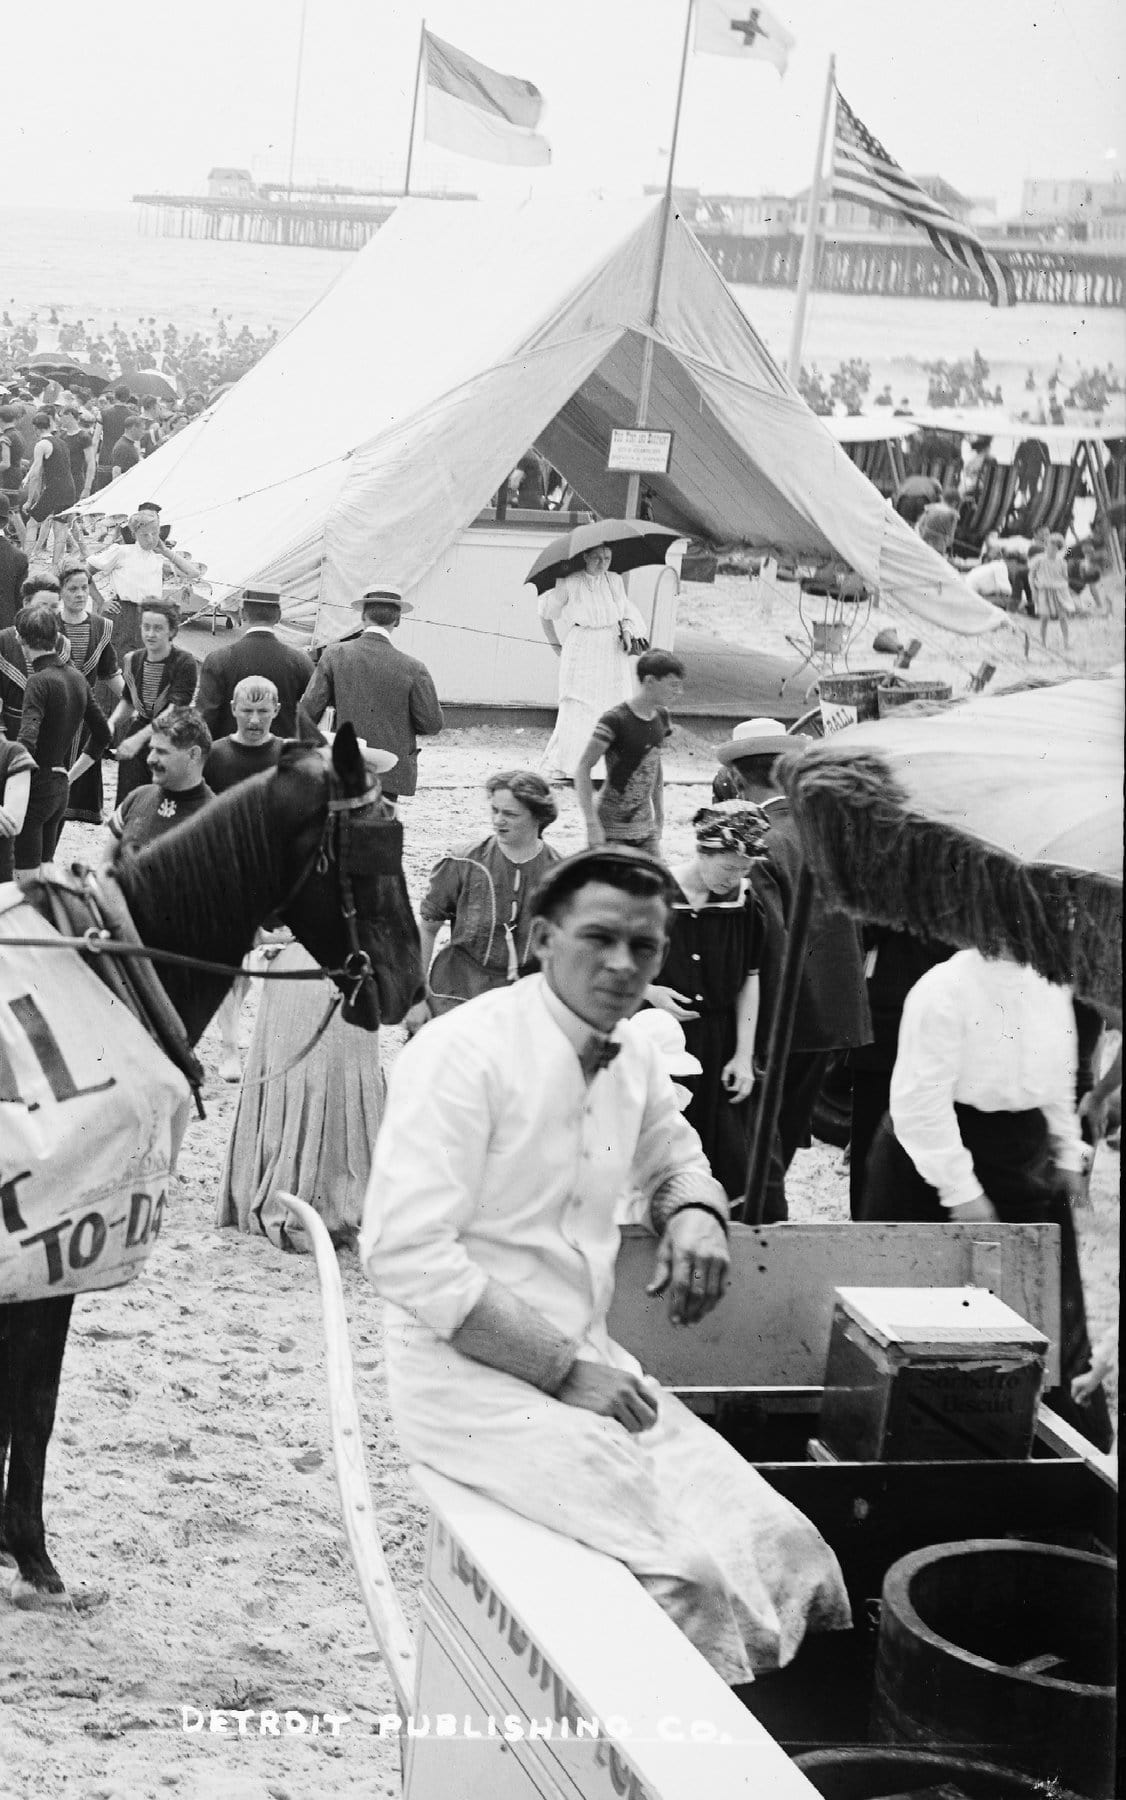 On the beach at Atlantic City (around 1904) (3)